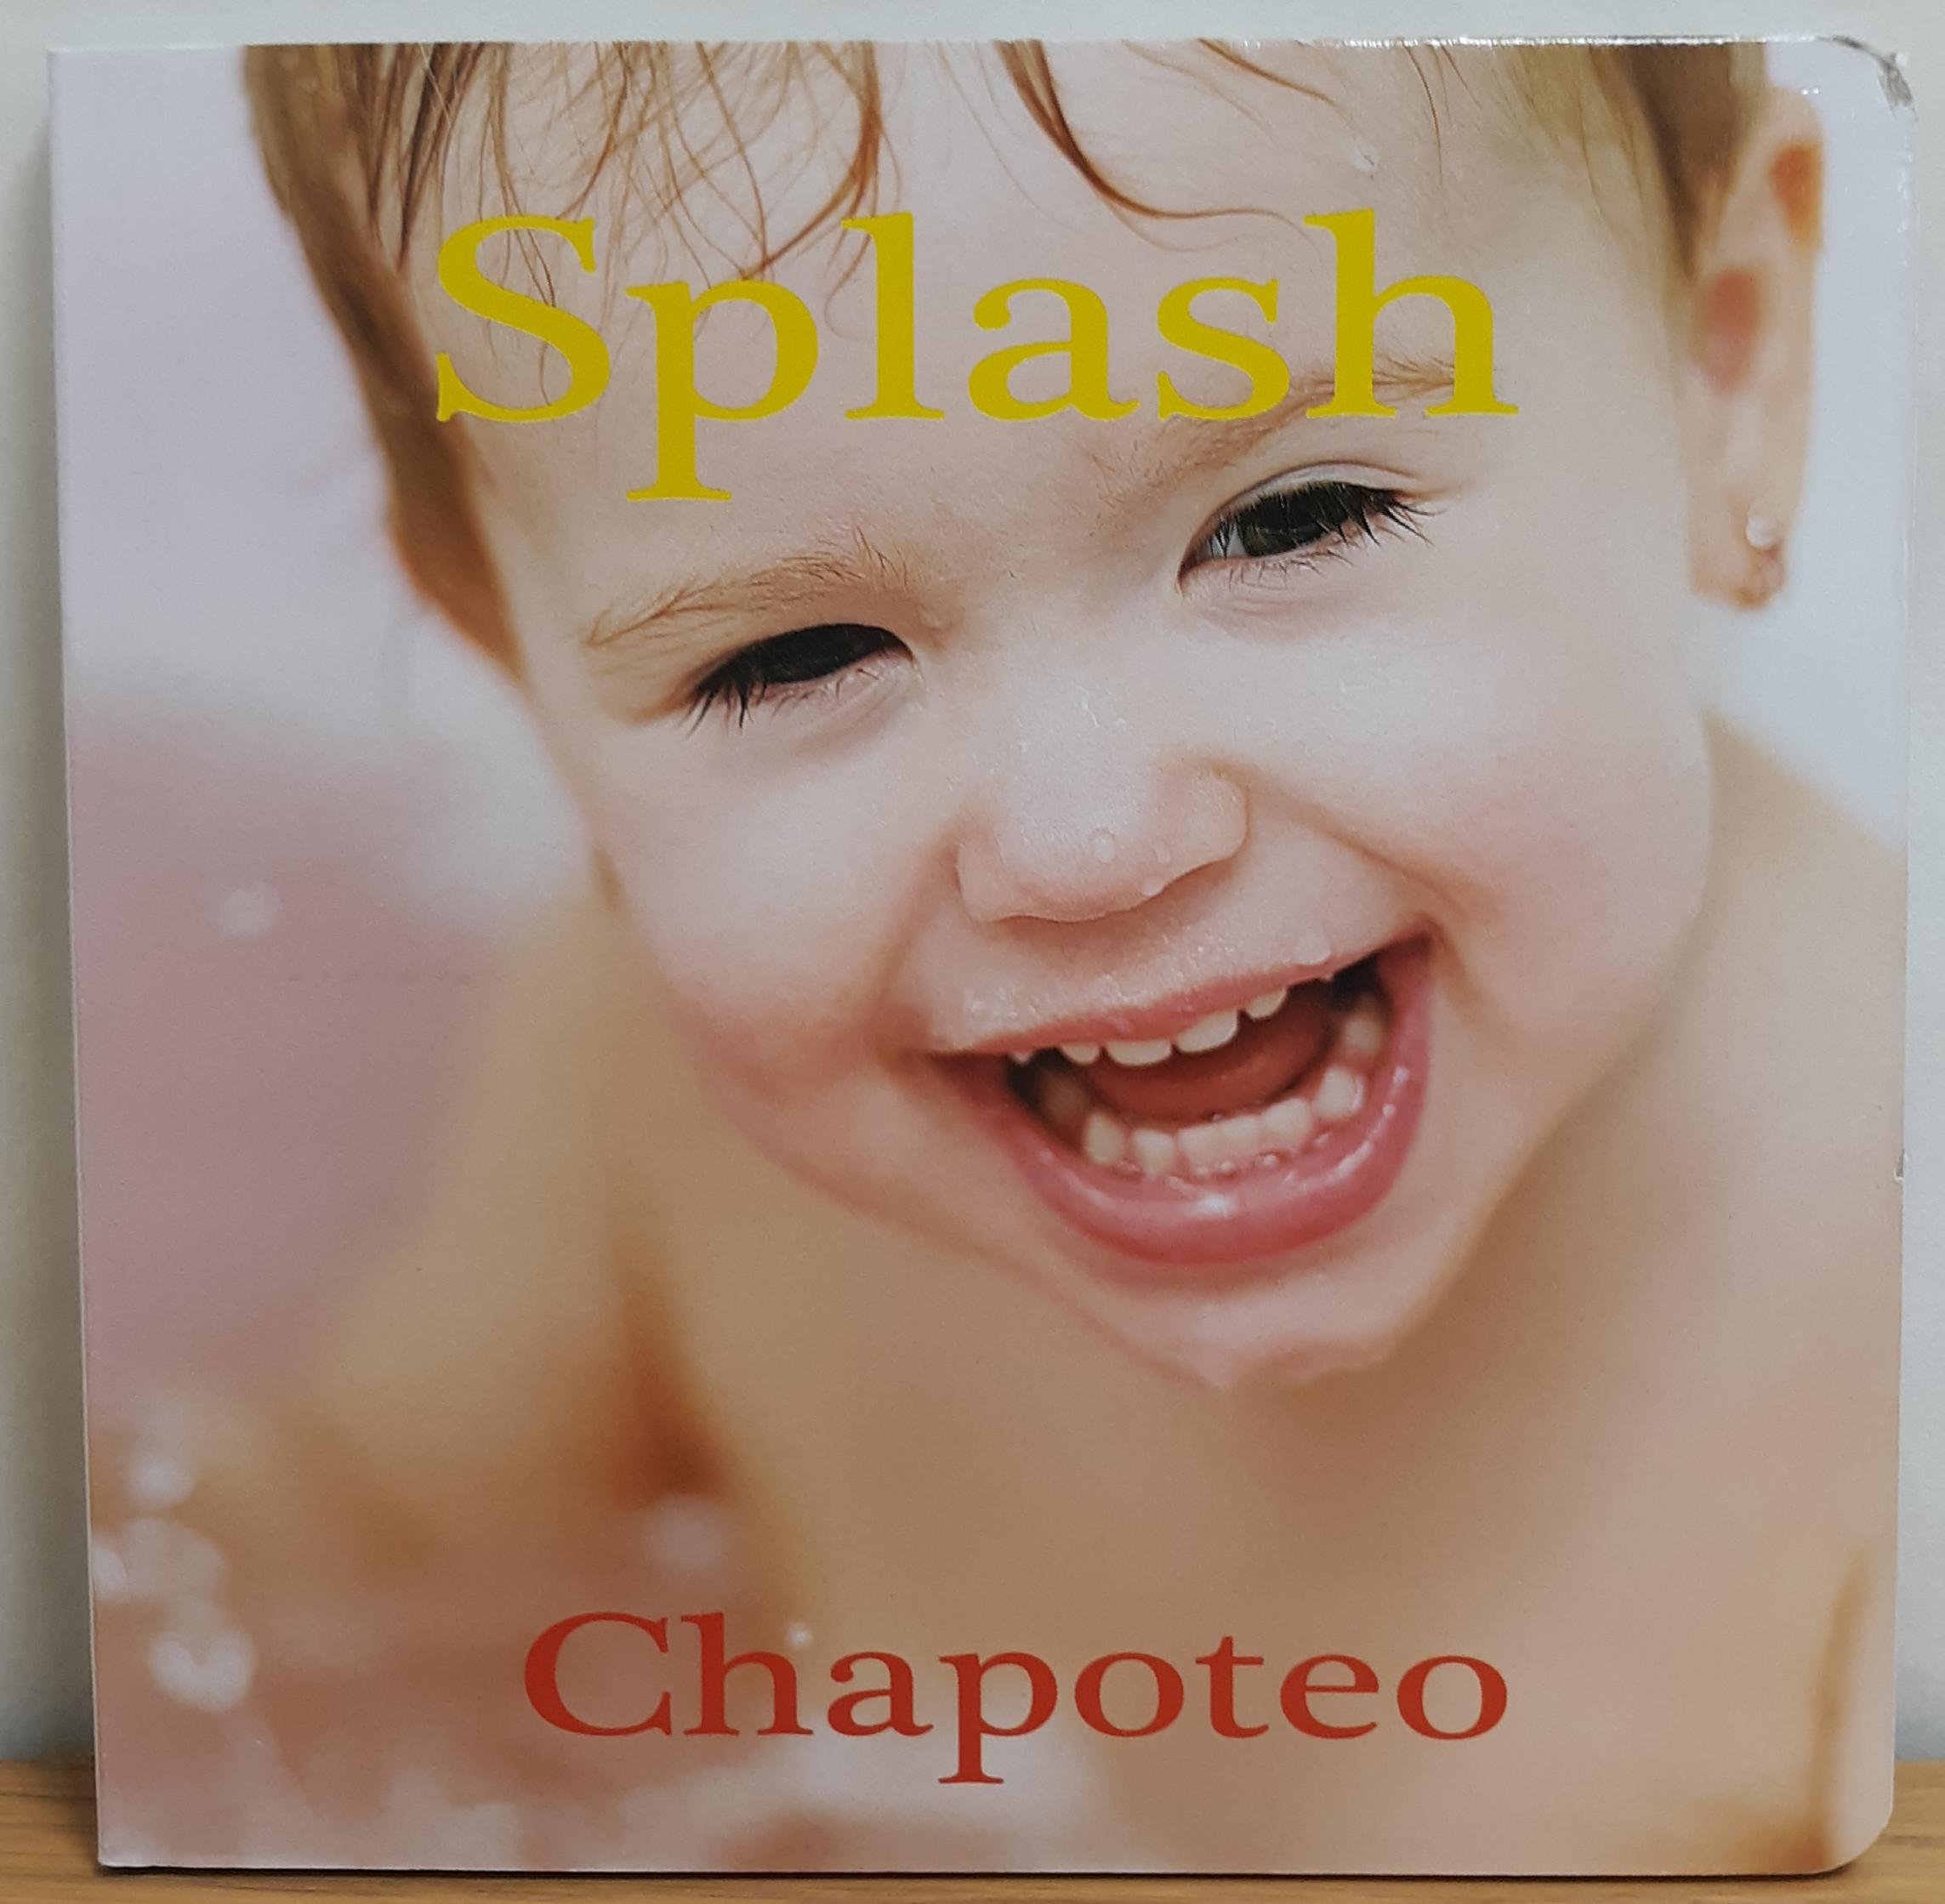 https://0201.nccdn.net/1_2/000/000/0ab/ce6/splash.png